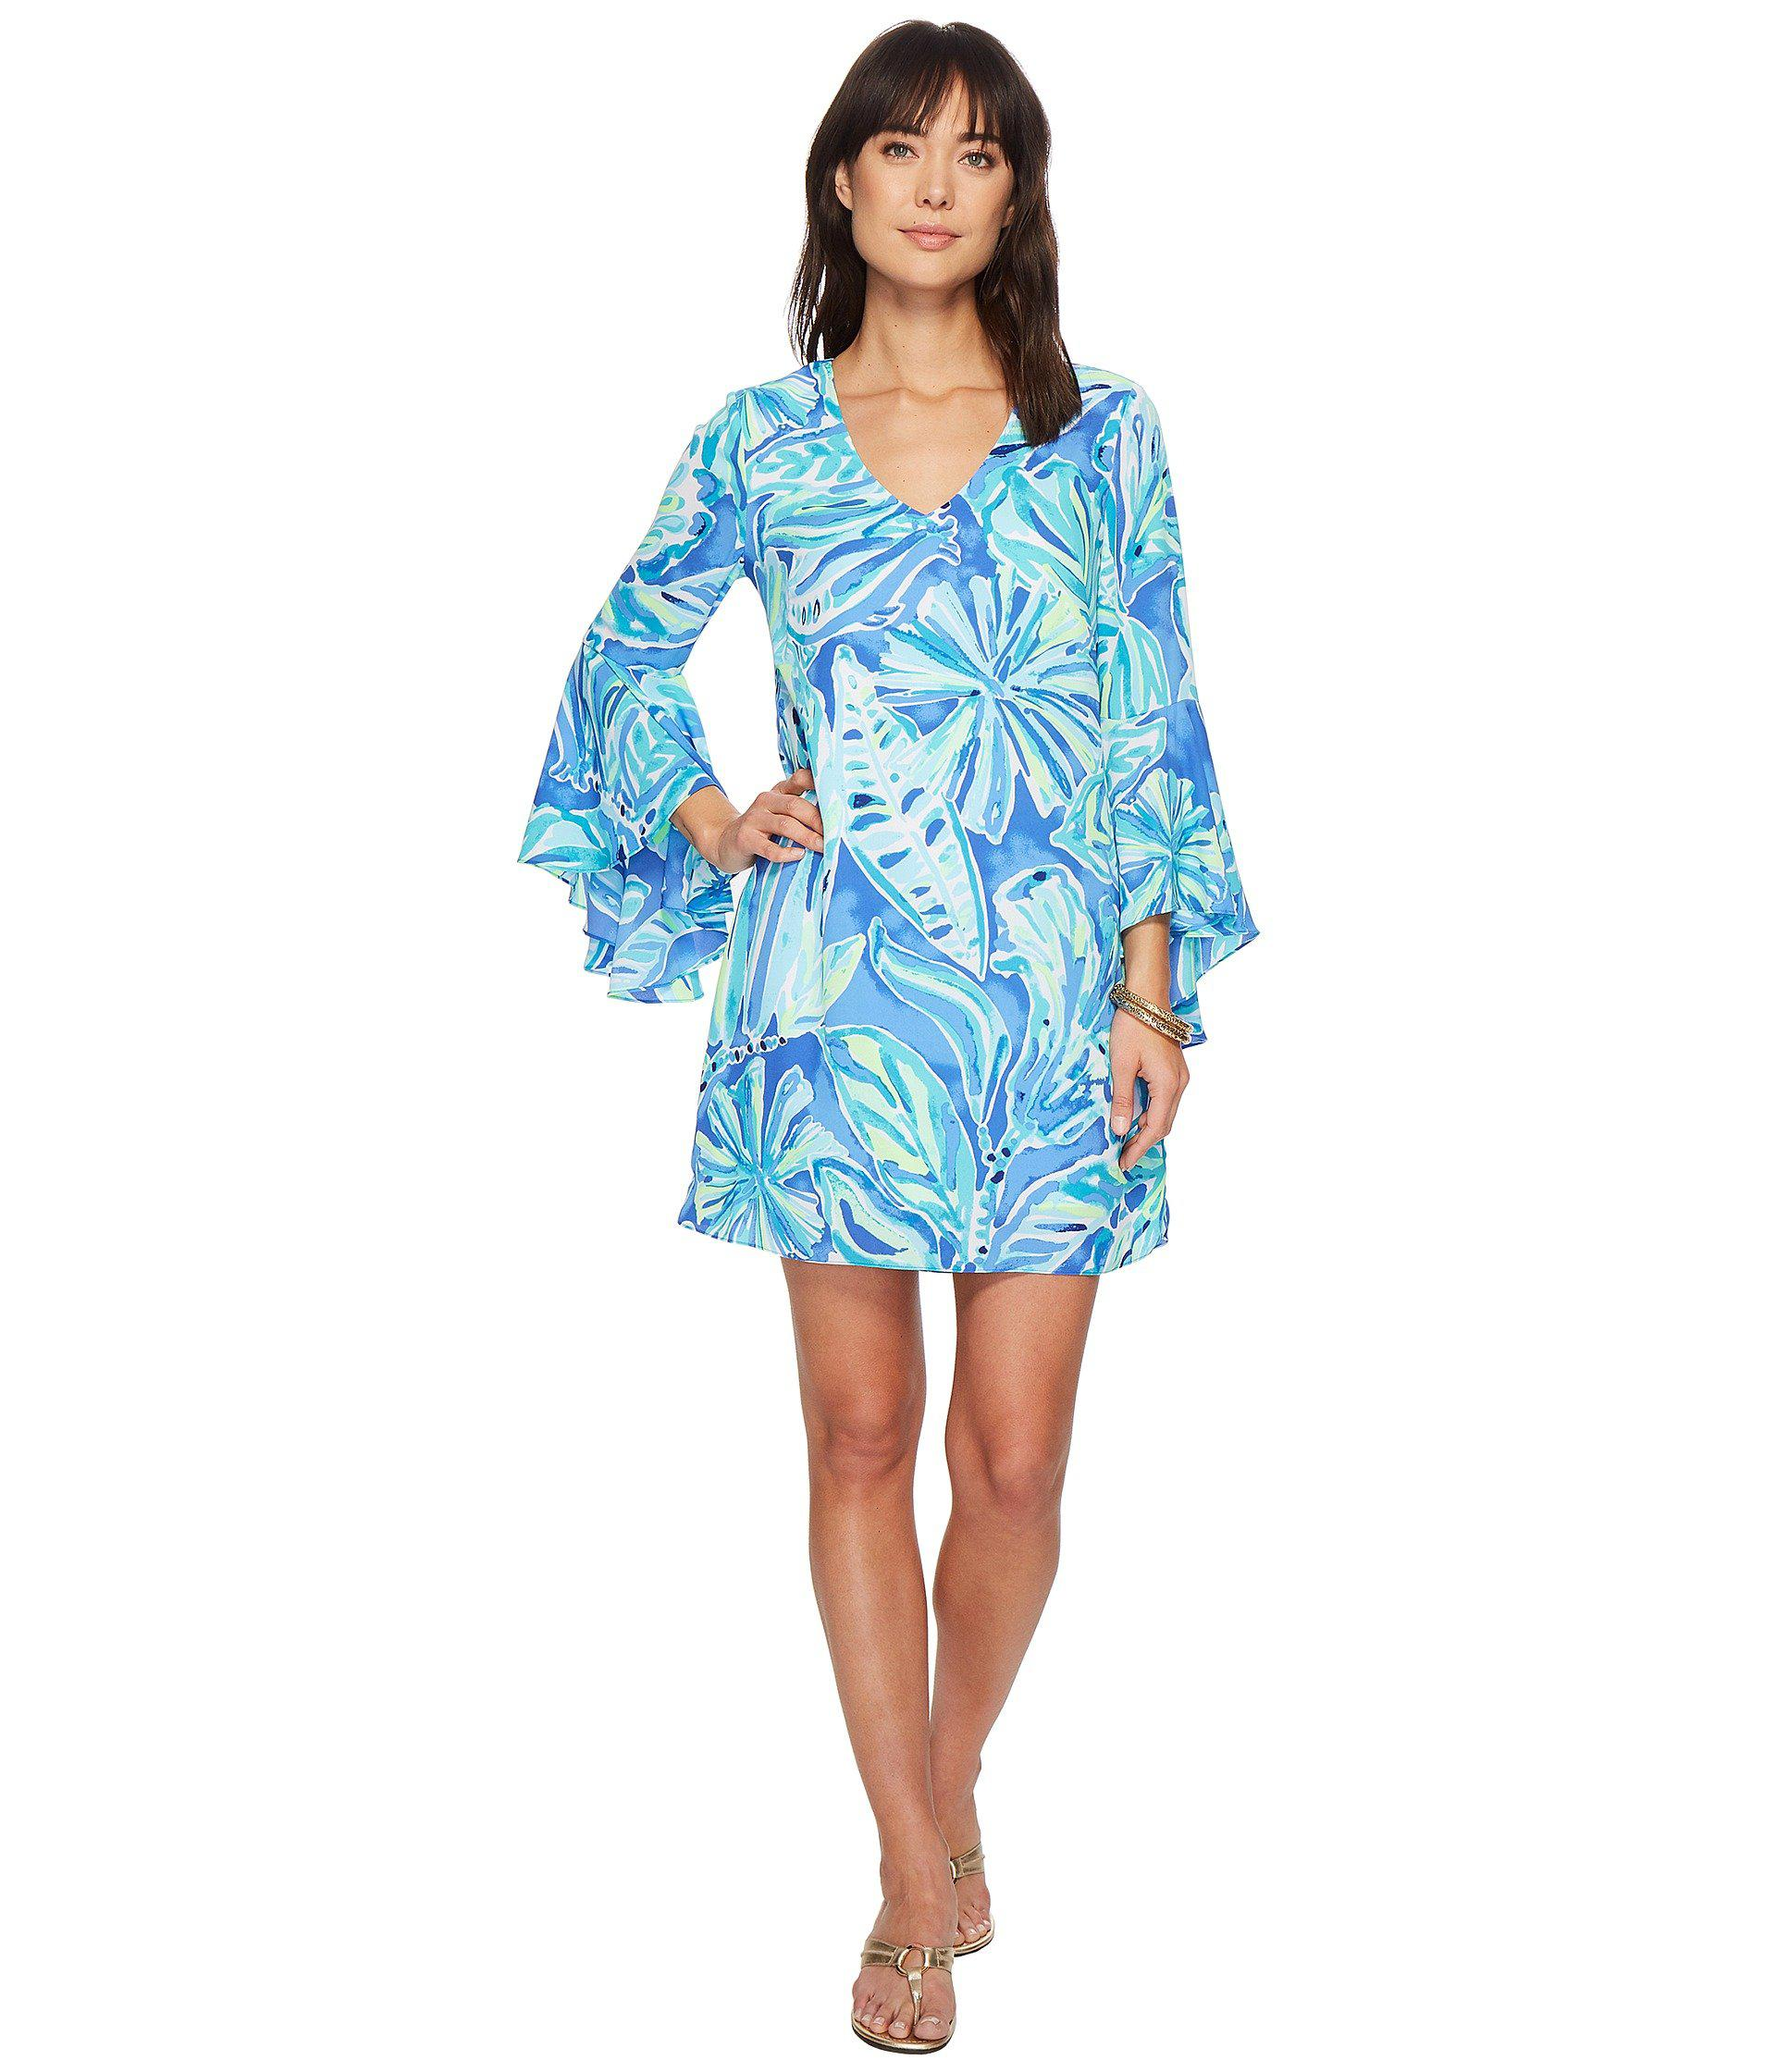 Lyst - Lilly Pulitzer Rosalia Dress in Blue